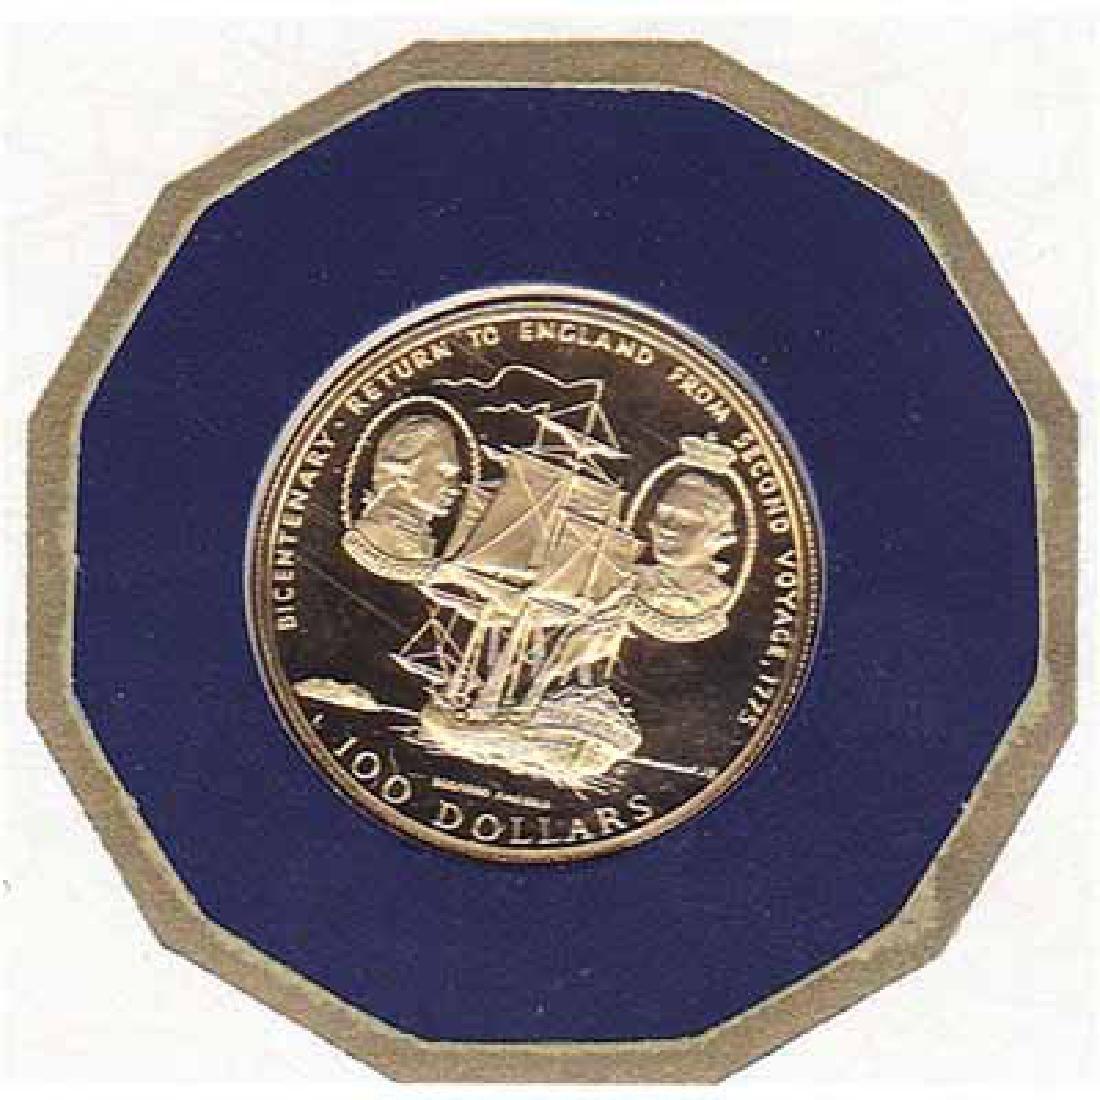 Cook Islands $100 Gold PF 1975 Cook Bicentenary